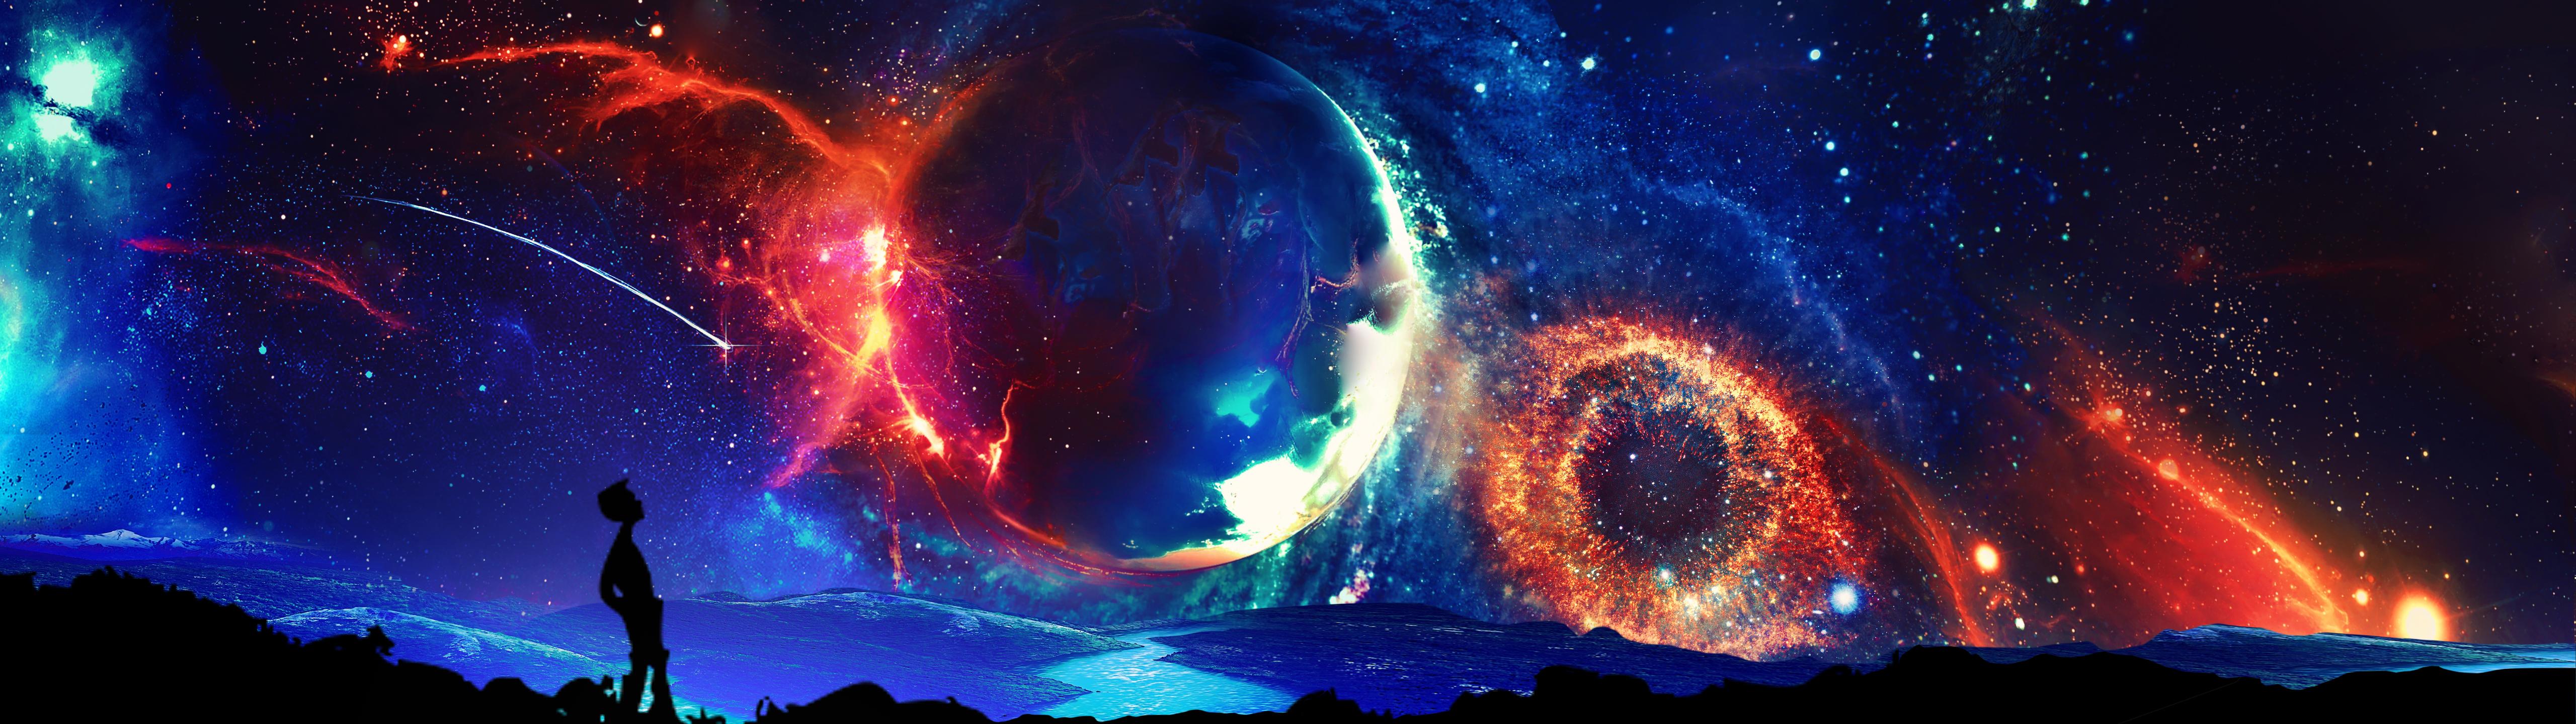 Portal 2 dual screen wallpaper gaming - Science Fiction Full Hd Fond D 233 Cran And Arri 232 Re Plan